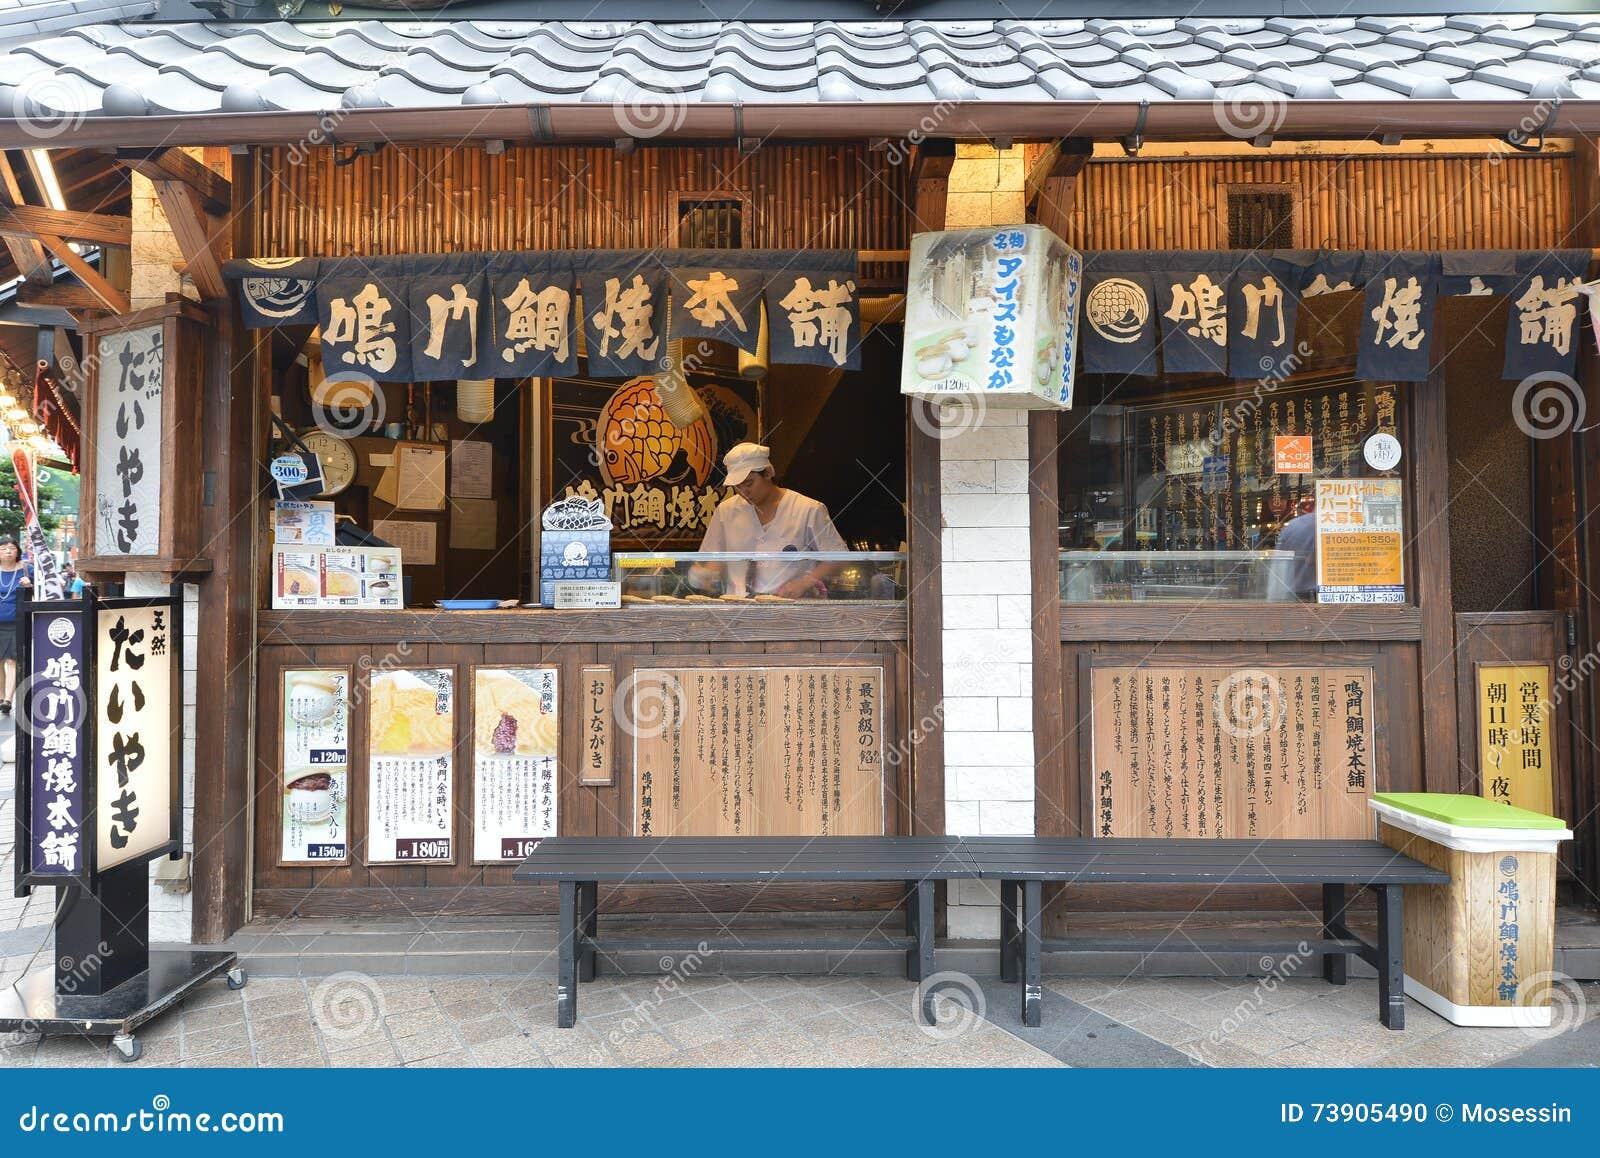 Japan Kobe Street Restaurant Exterior Editorial Image Image Of Kobe Traditional 73905490